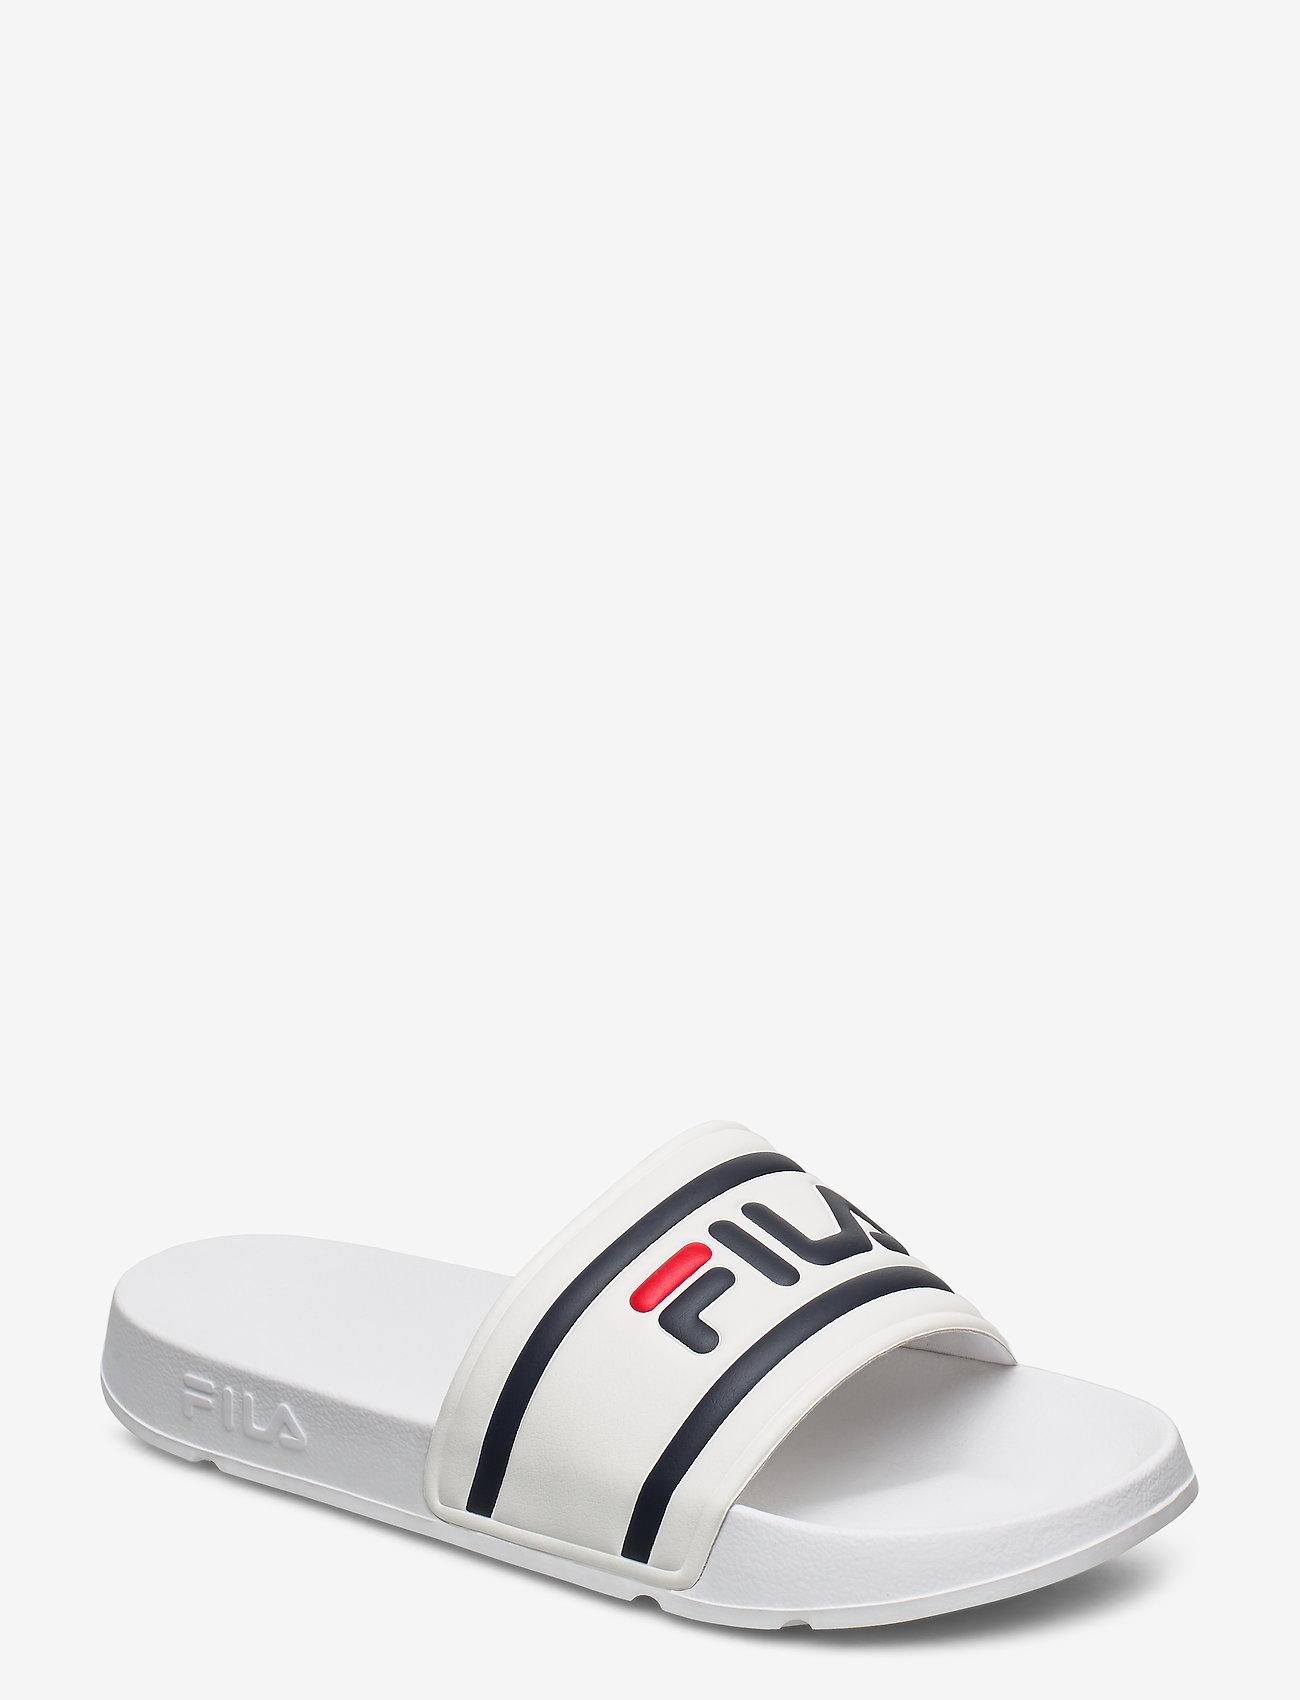 FILA - Morro Bay slipper 2.0 - pool sliders - white - 0